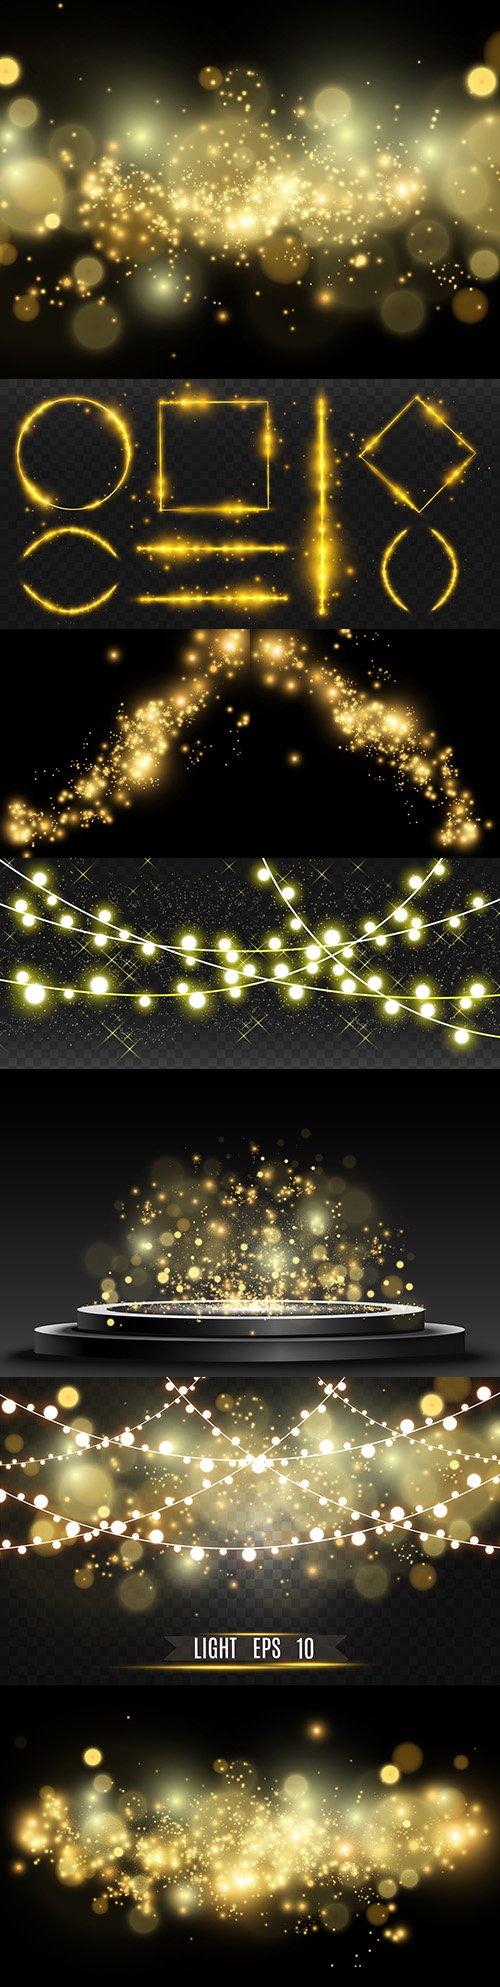 Shiny gold dust sparkling shiny light effect